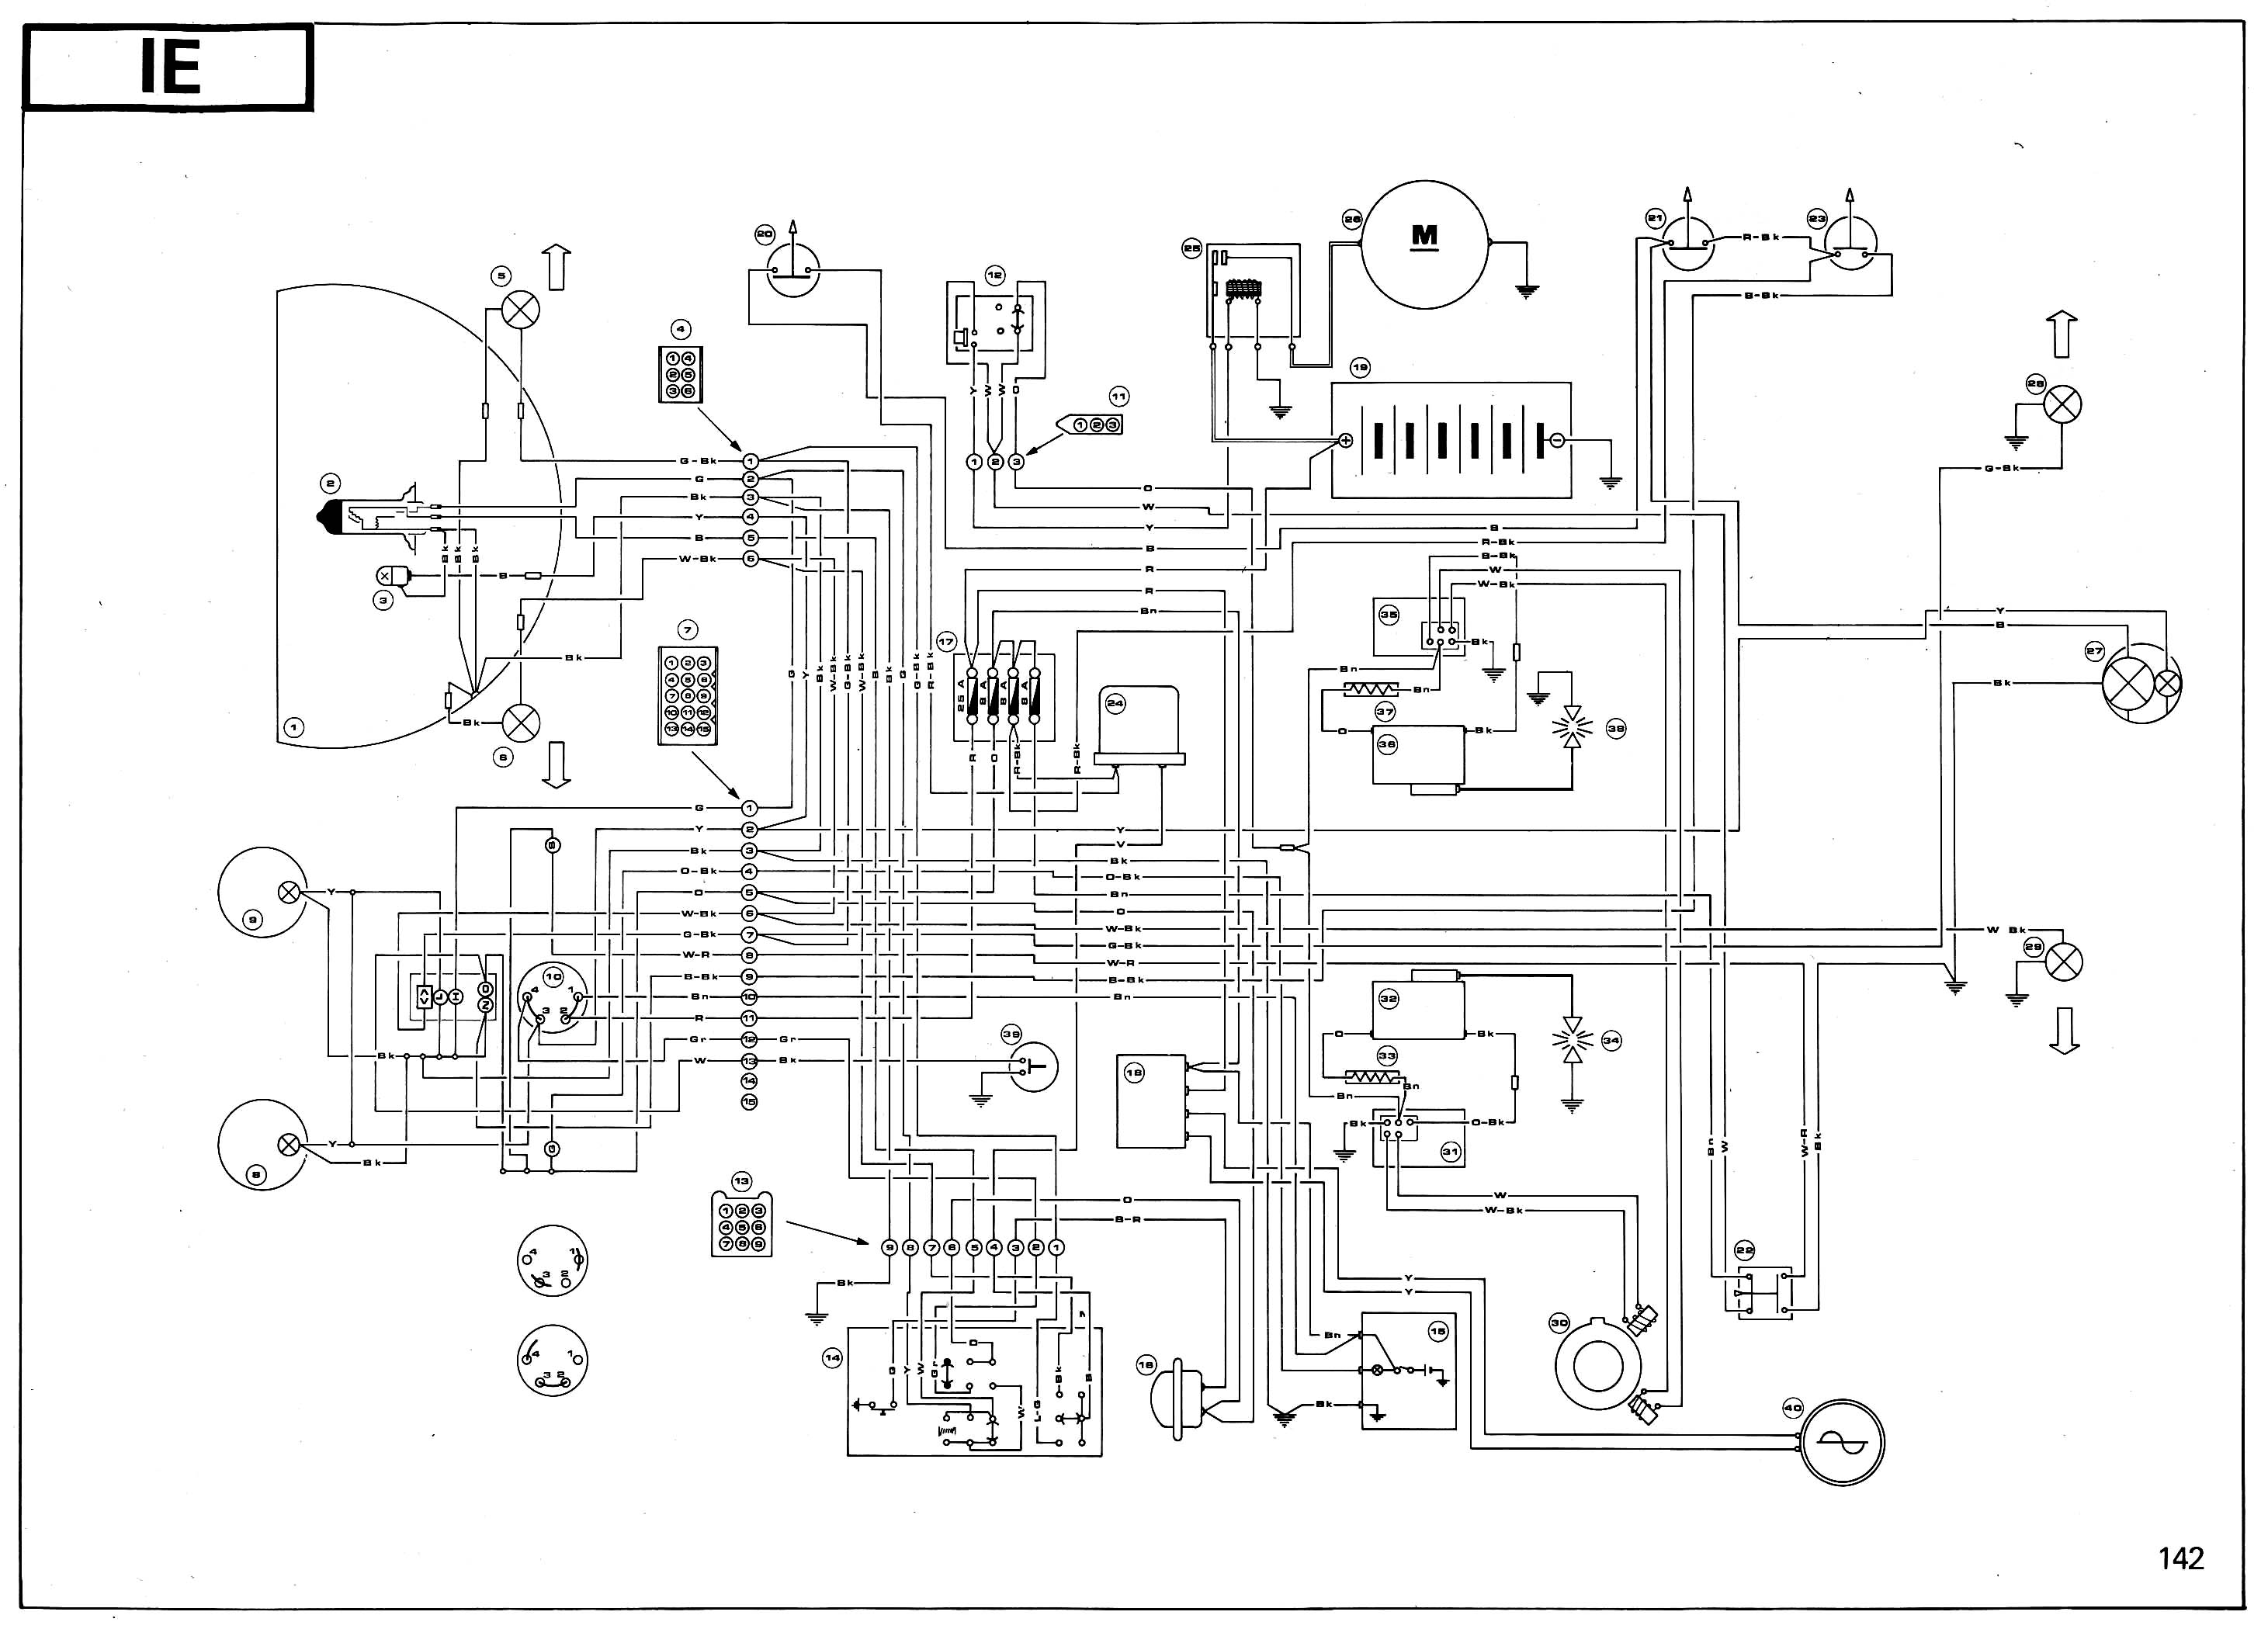 Lifan 49cc Wiring Diagram | Wiring Diagram on cf moto wiring diagram, sinski wiring diagram, motofino wiring diagram, xingyue wiring diagram, sunl wiring diagram, garelli wiring diagram, victory wiring diagram, hyosung wiring diagram, kawasaki wiring diagram, redcat wiring diagram, nst wiring diagram, ducati wiring diagram, coolster wiring diagram, honda wiring diagram, the trike shop wiring diagram, tomos wiring diagram, kasea wiring diagram, alpha sports wiring diagram, baja wiring diagram, ktm wiring diagram,